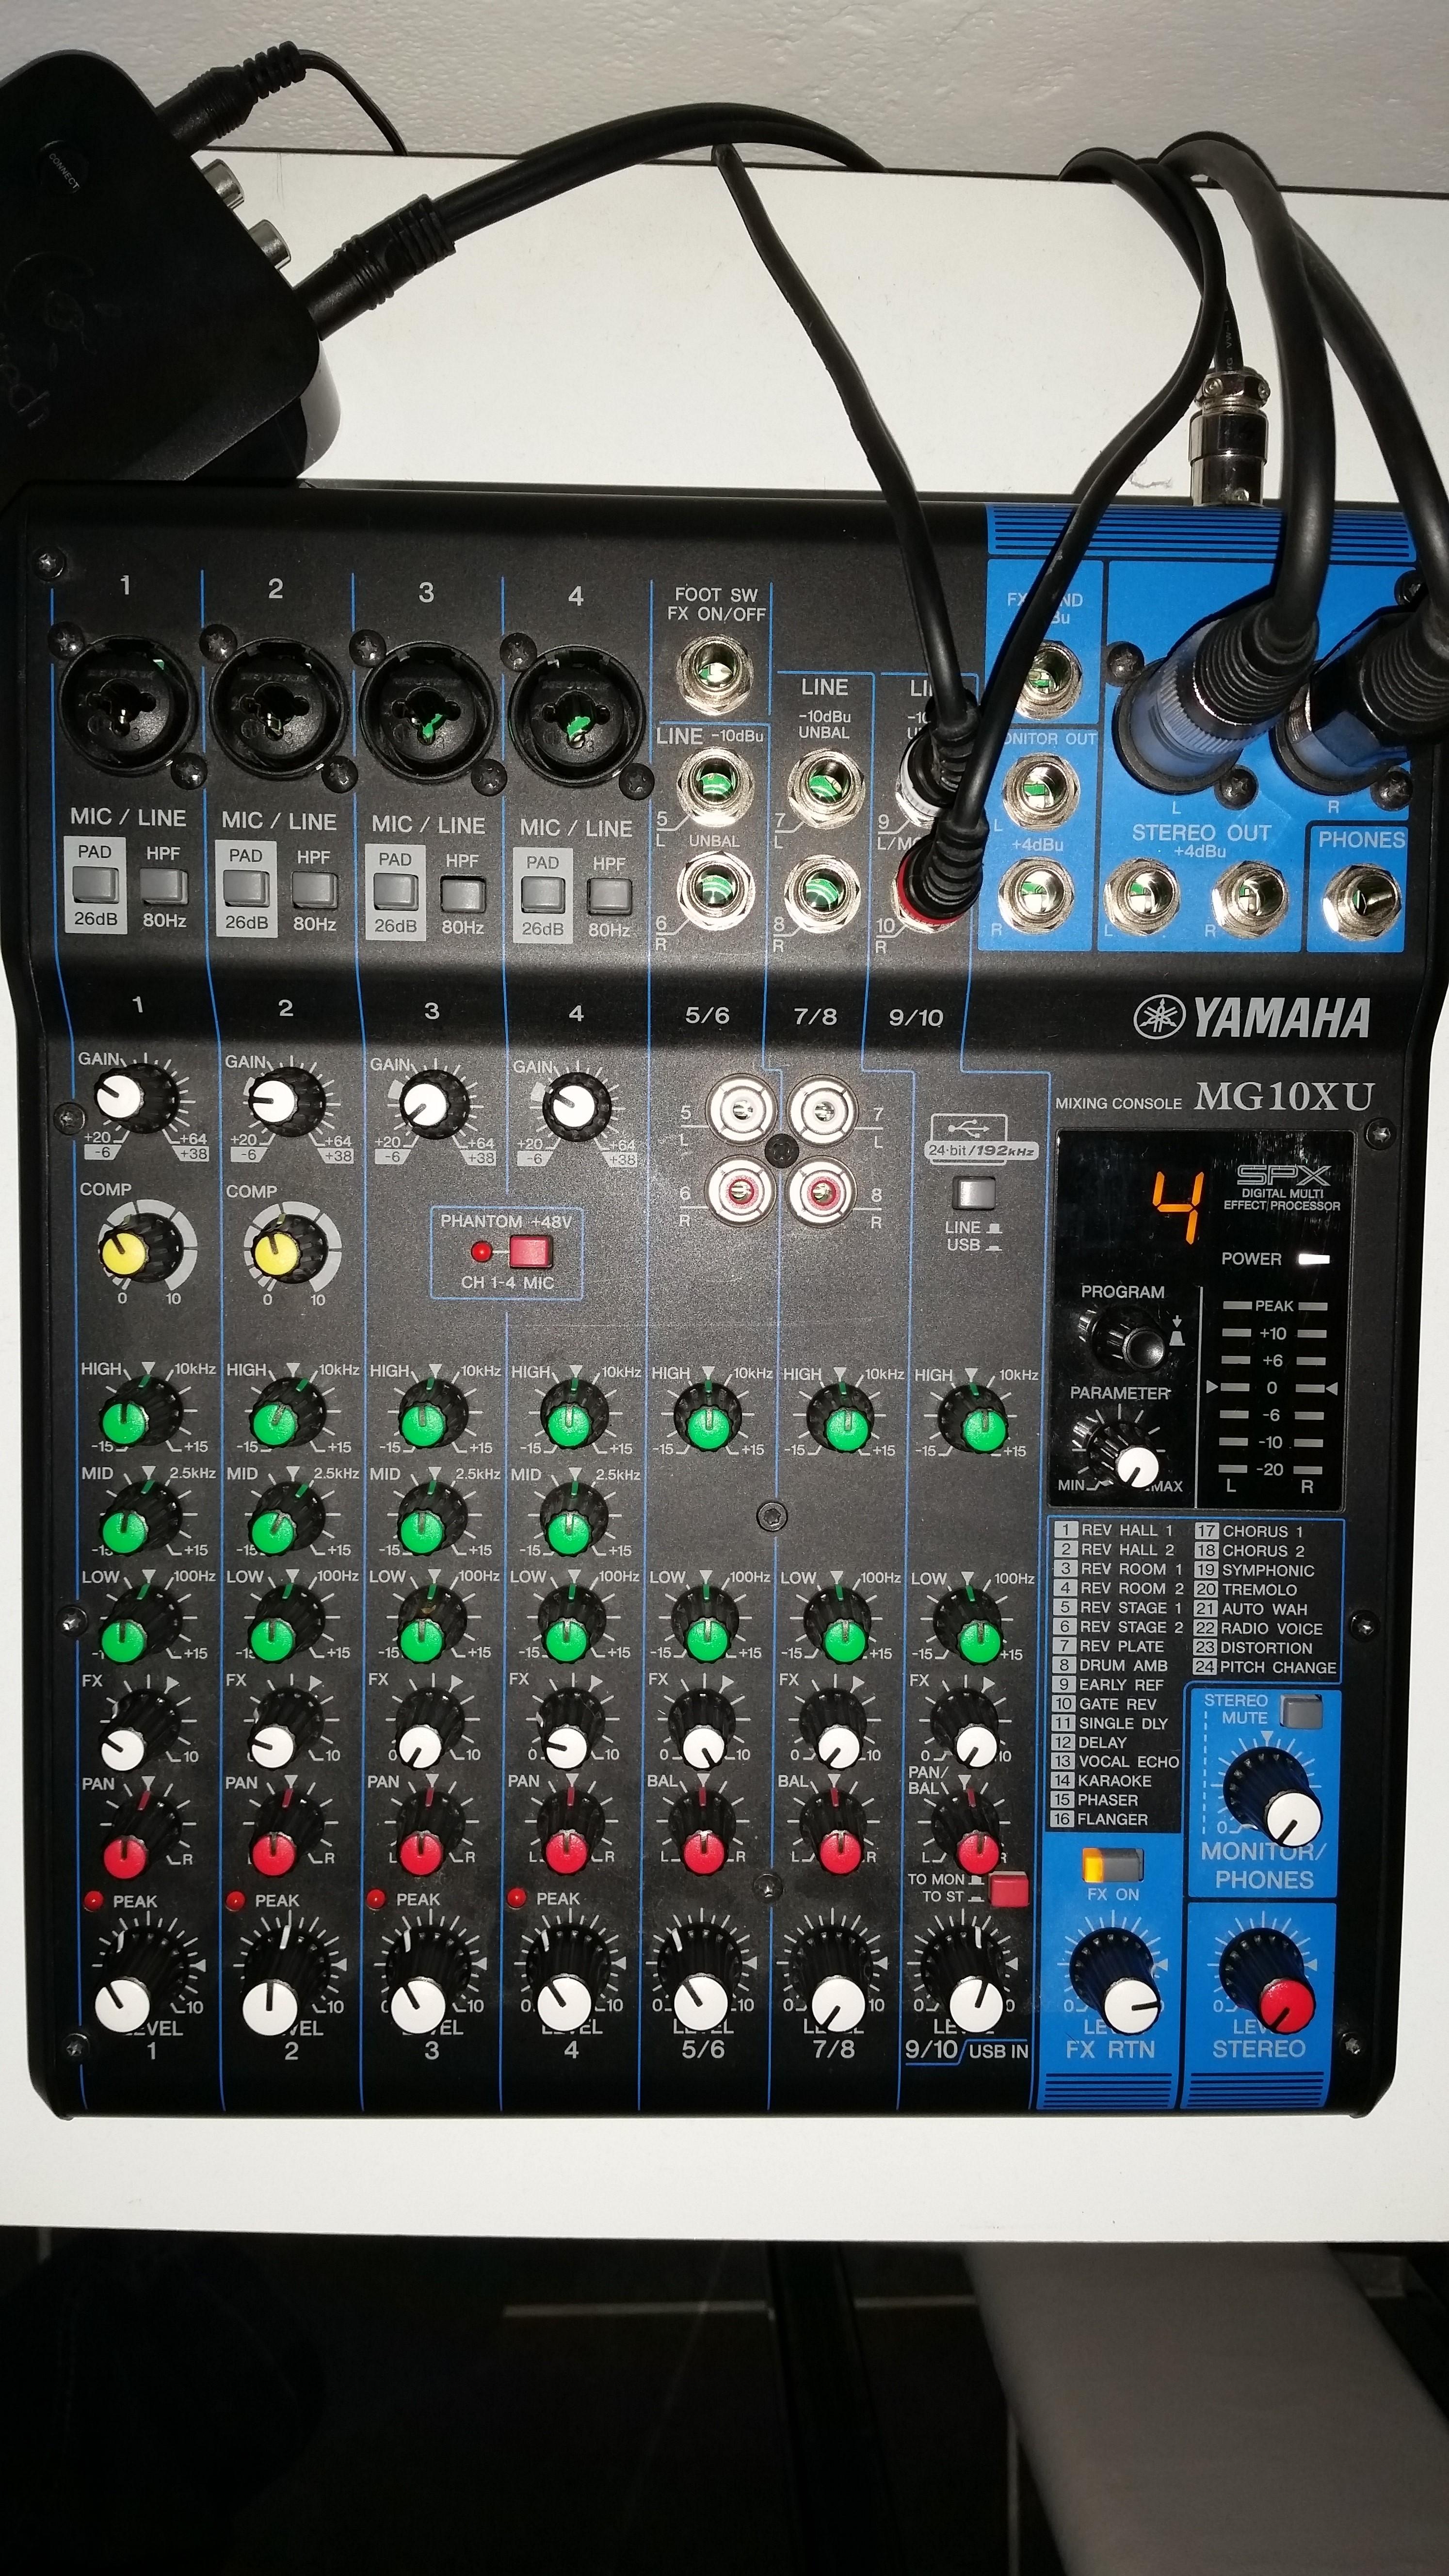 Yamaha mg10xu image 1038738 audiofanzine for Yamaha mg10xu review